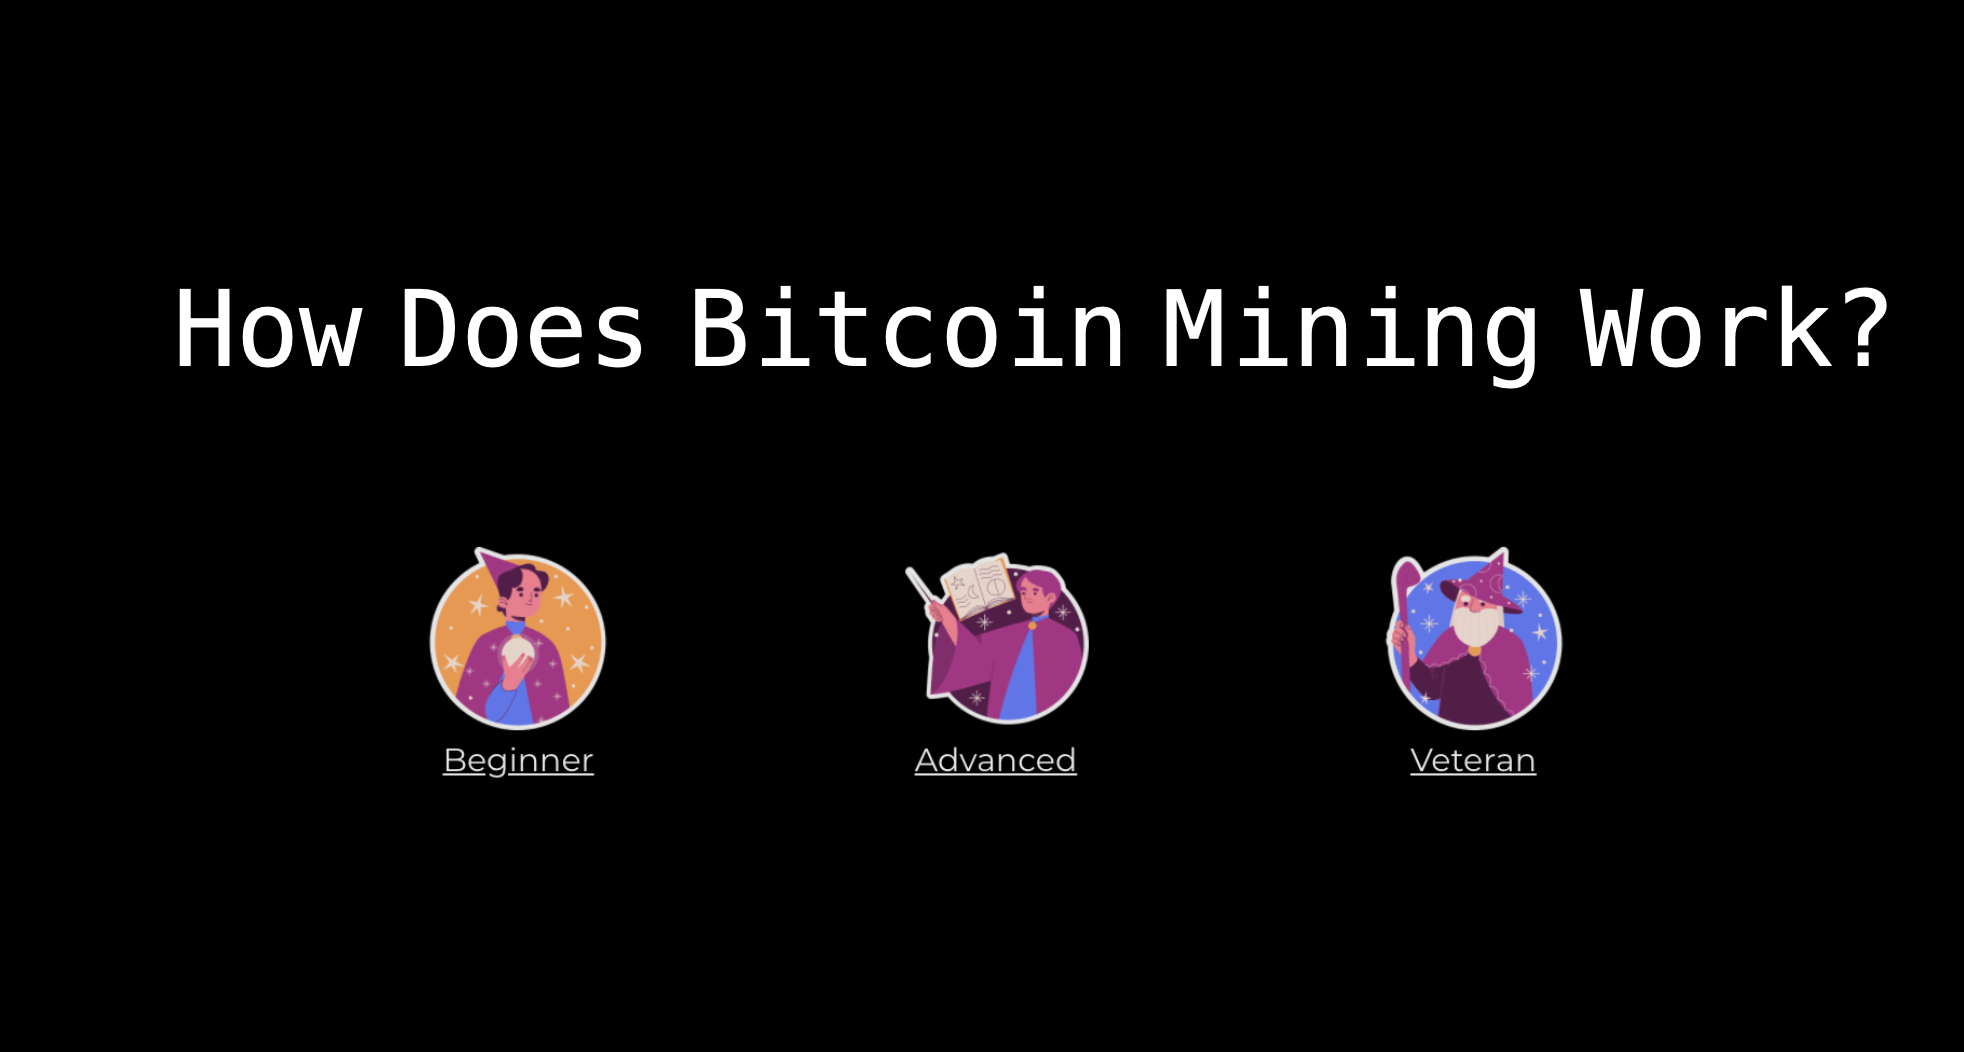 Bitcoin Mining Explained: Beginner